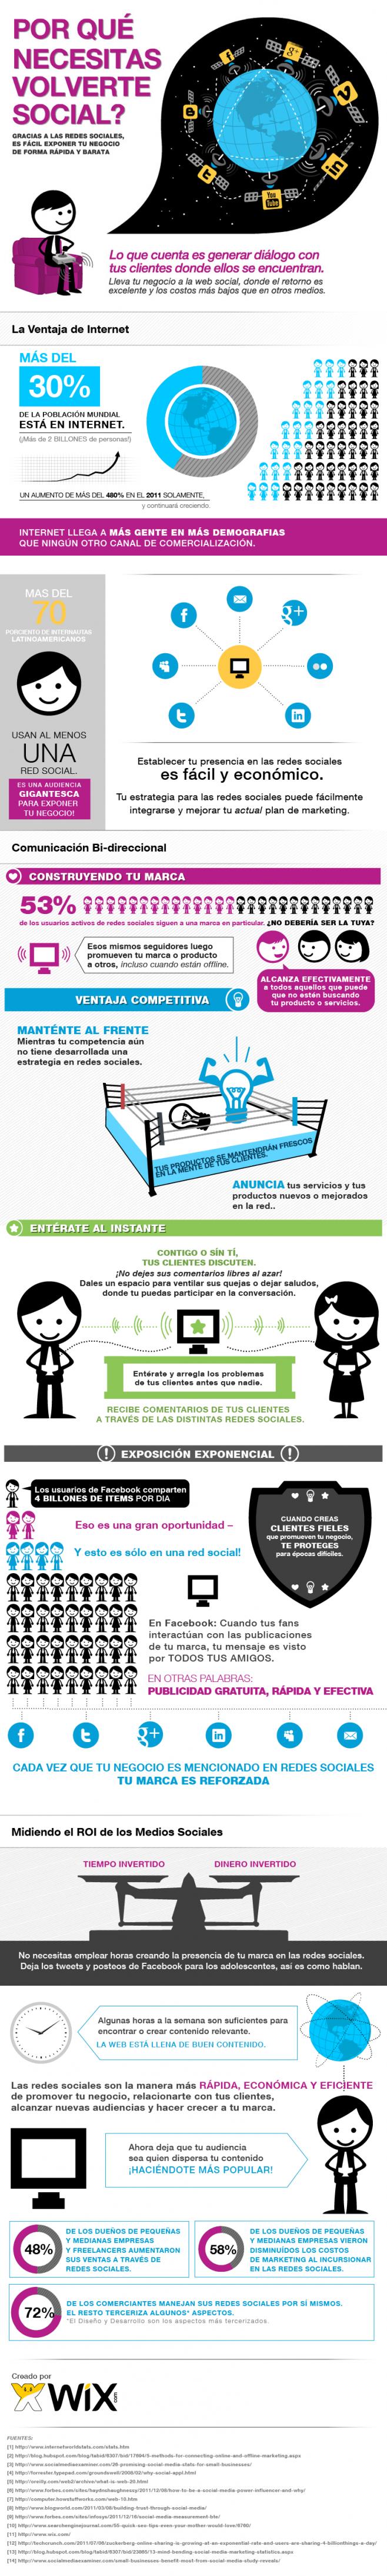 Por qué necesitas volverte Social #infografia #infographic #socialmedia#marketing